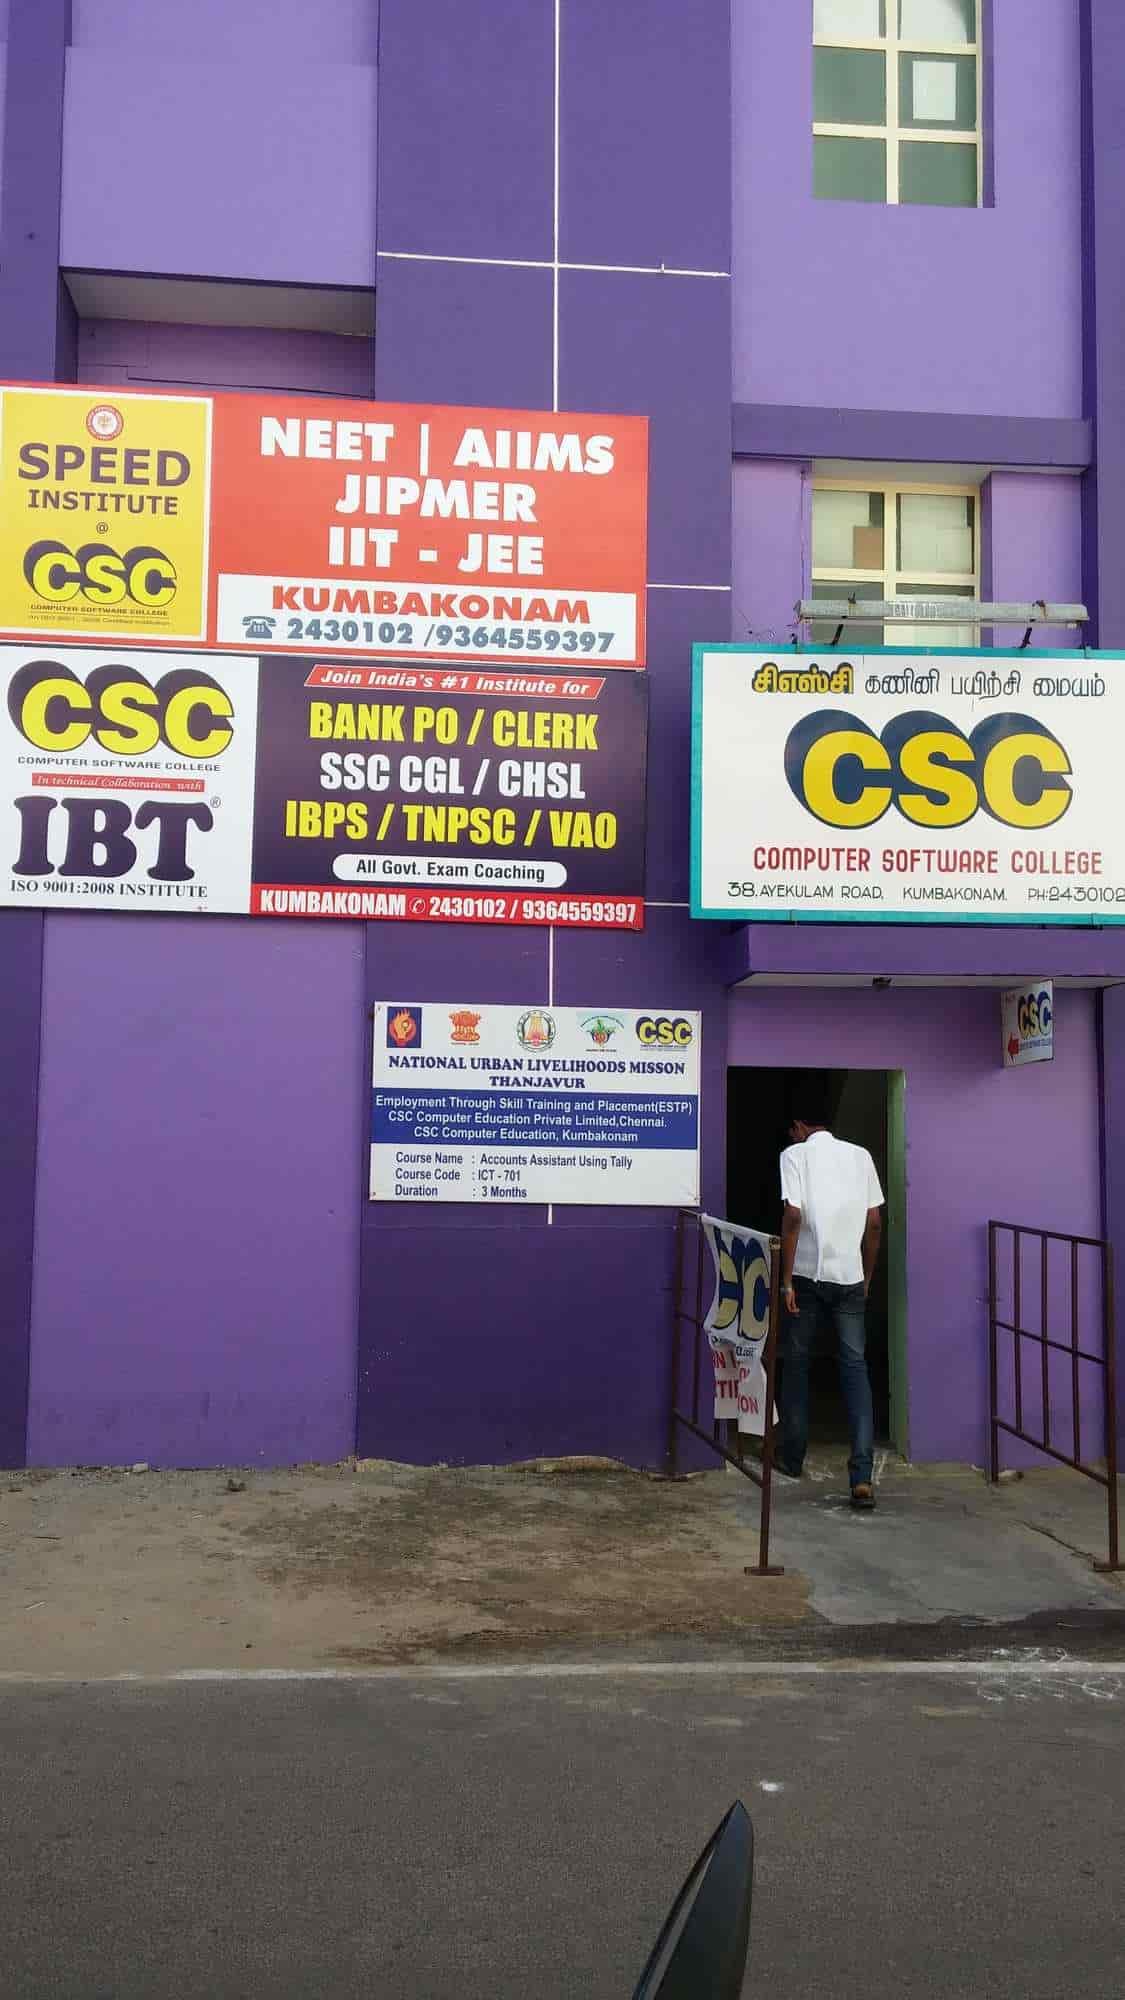 Top CNC Training Institute in Krishnarayar Agraharam - Best CNC